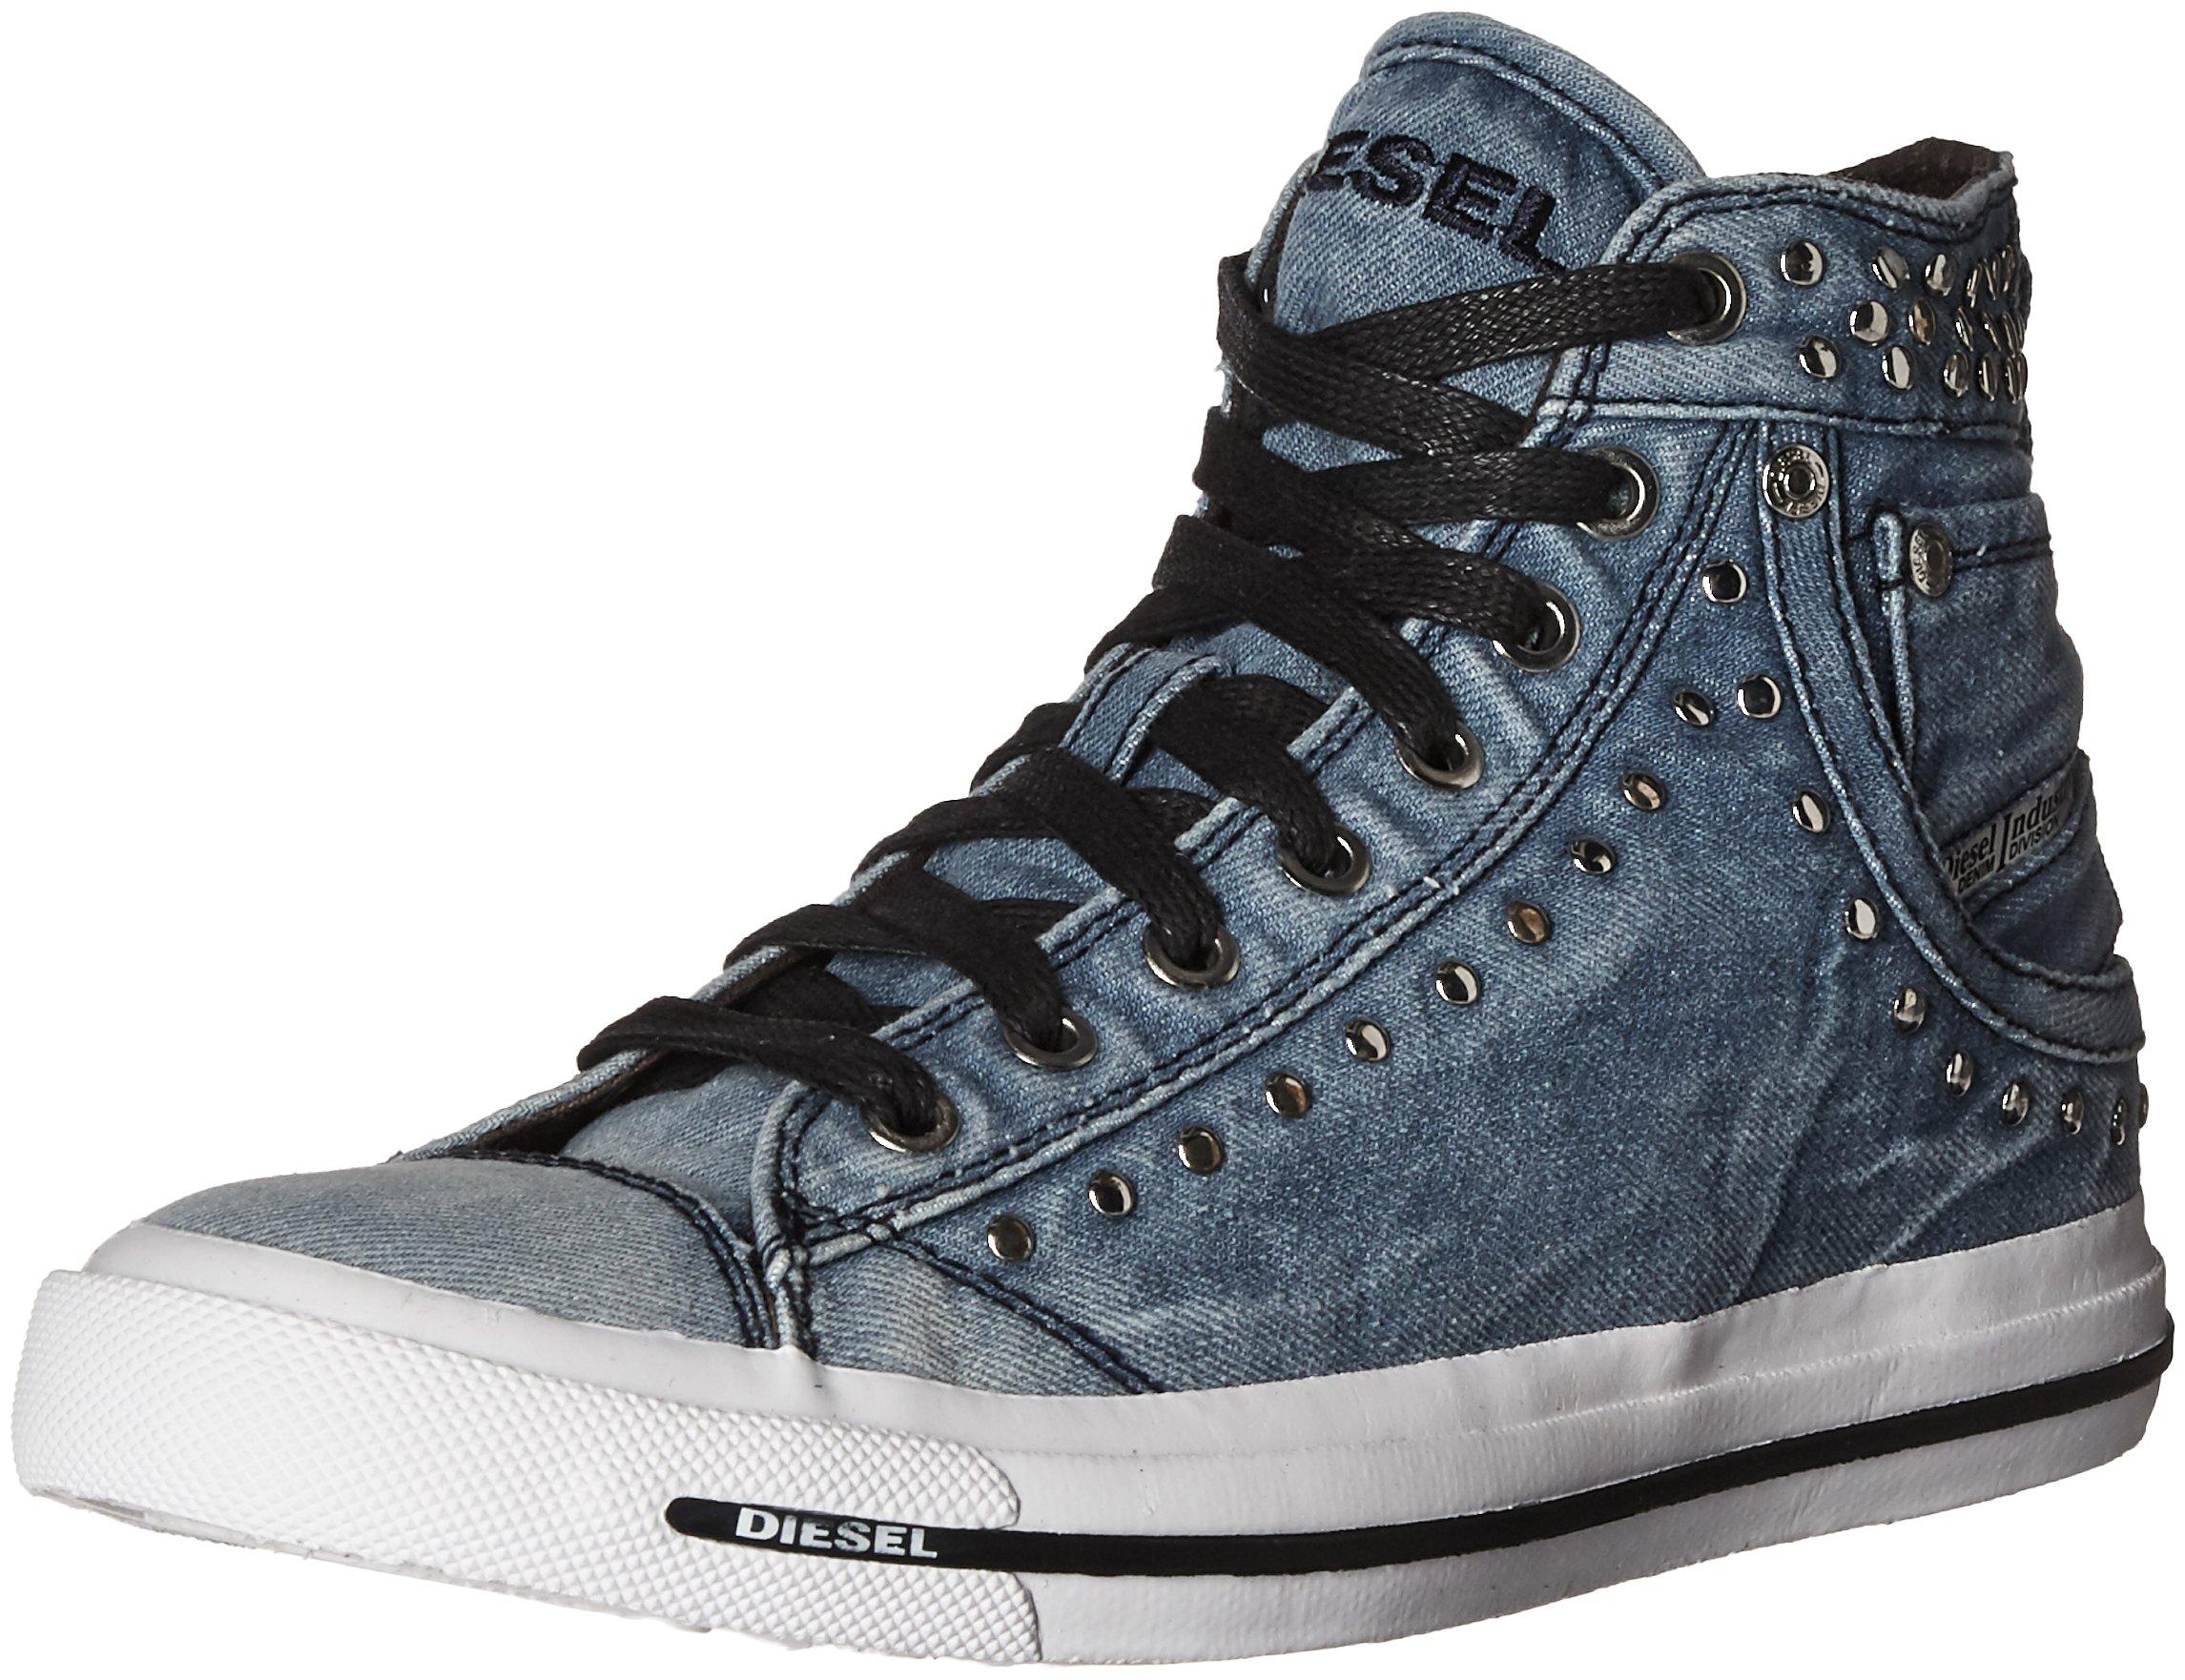 Diesel Women's Magnete Exposure Iv W Fashion Sneaker, Indigo, 8.5 M US